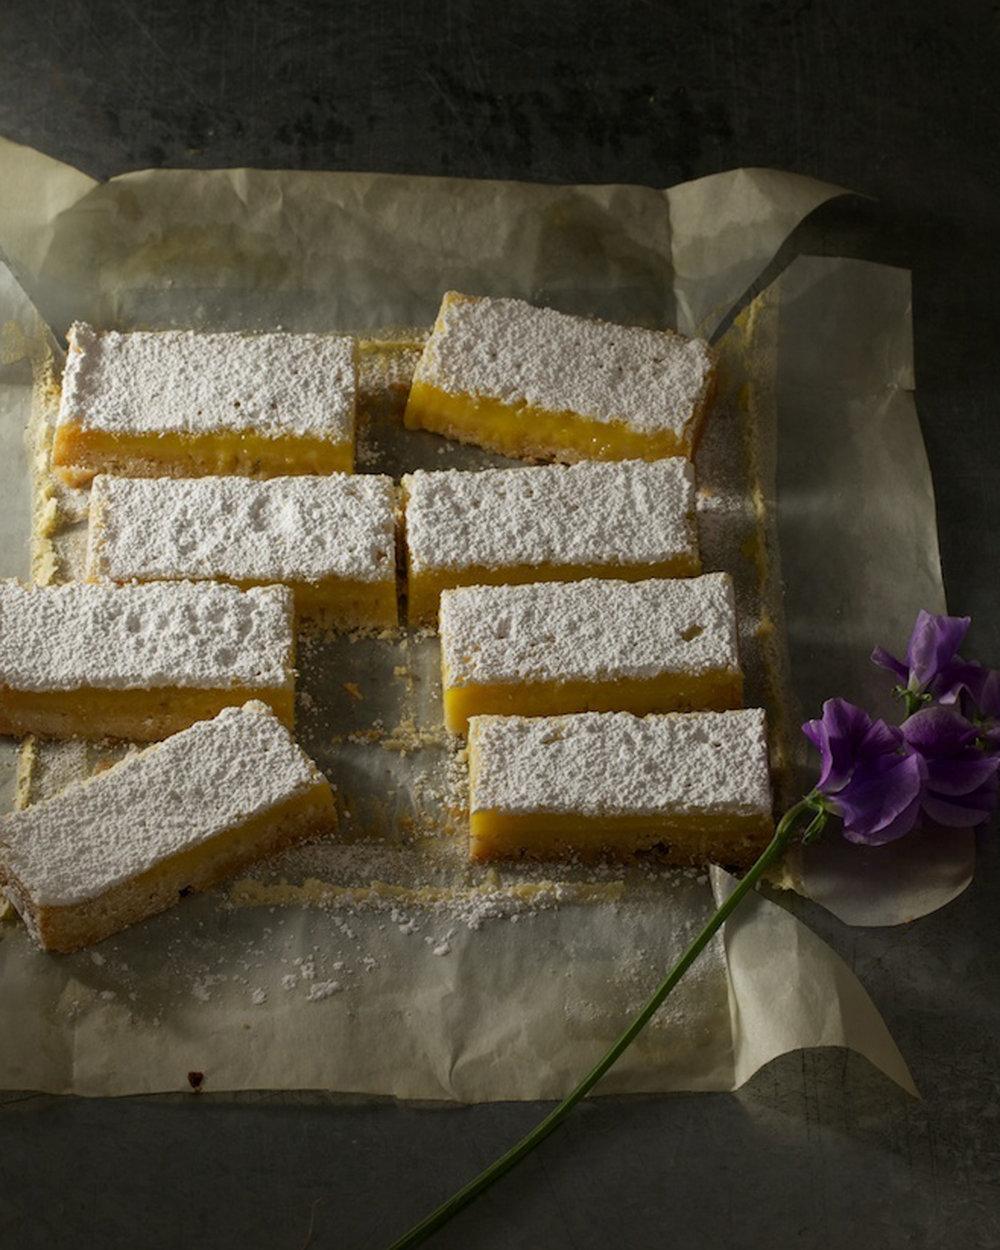 Paulette+Tavormina+Beekman+Dessert+Lemon+Squares.jpeg